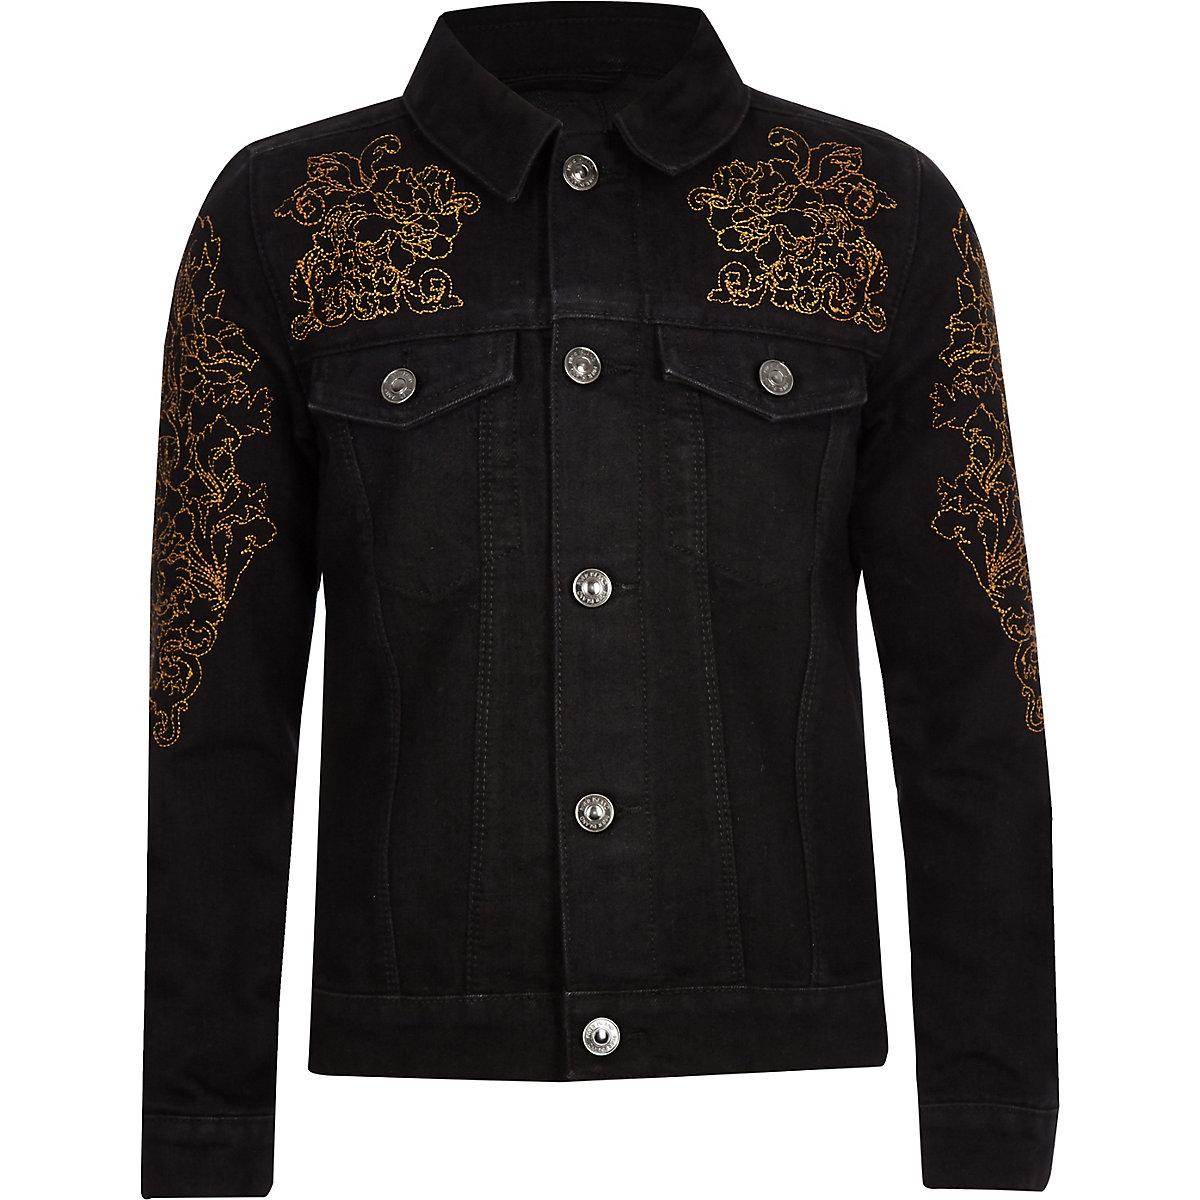 RI 30 boys black embroidered denim jacket